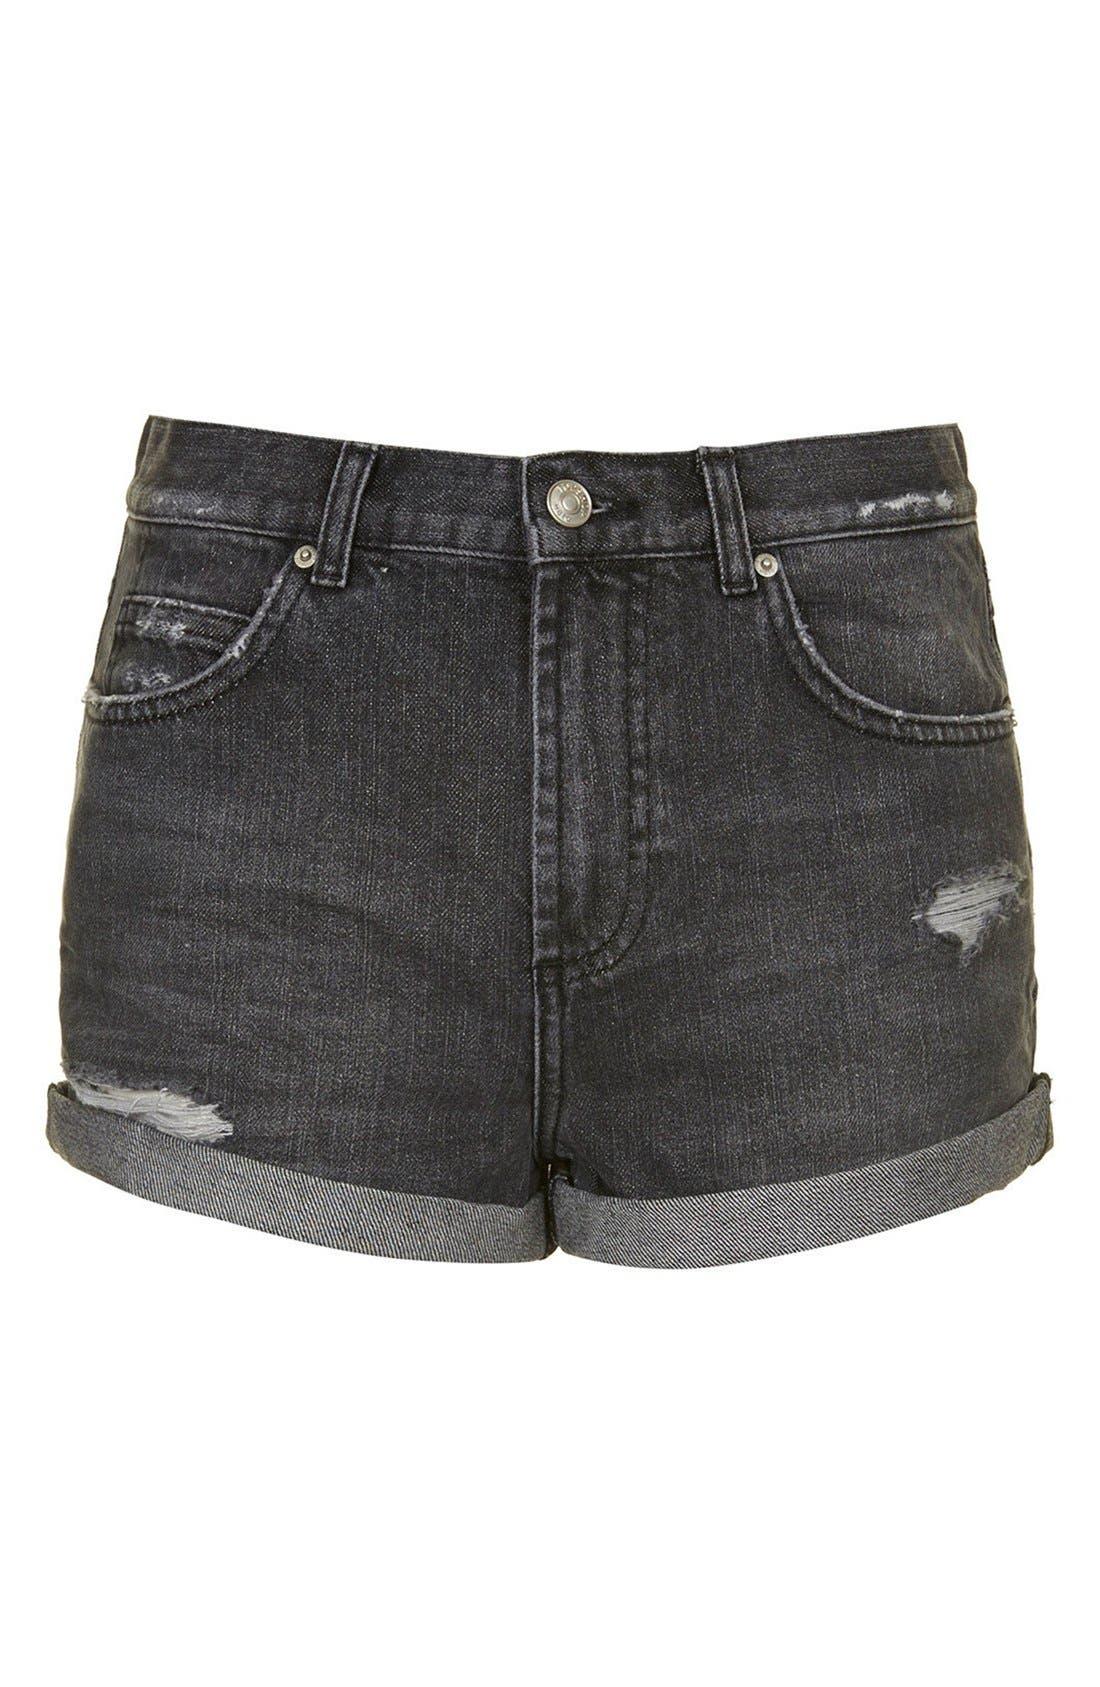 Alternate Image 3  - Topshop Moto 'Rosa' Cuffed Denim Shorts